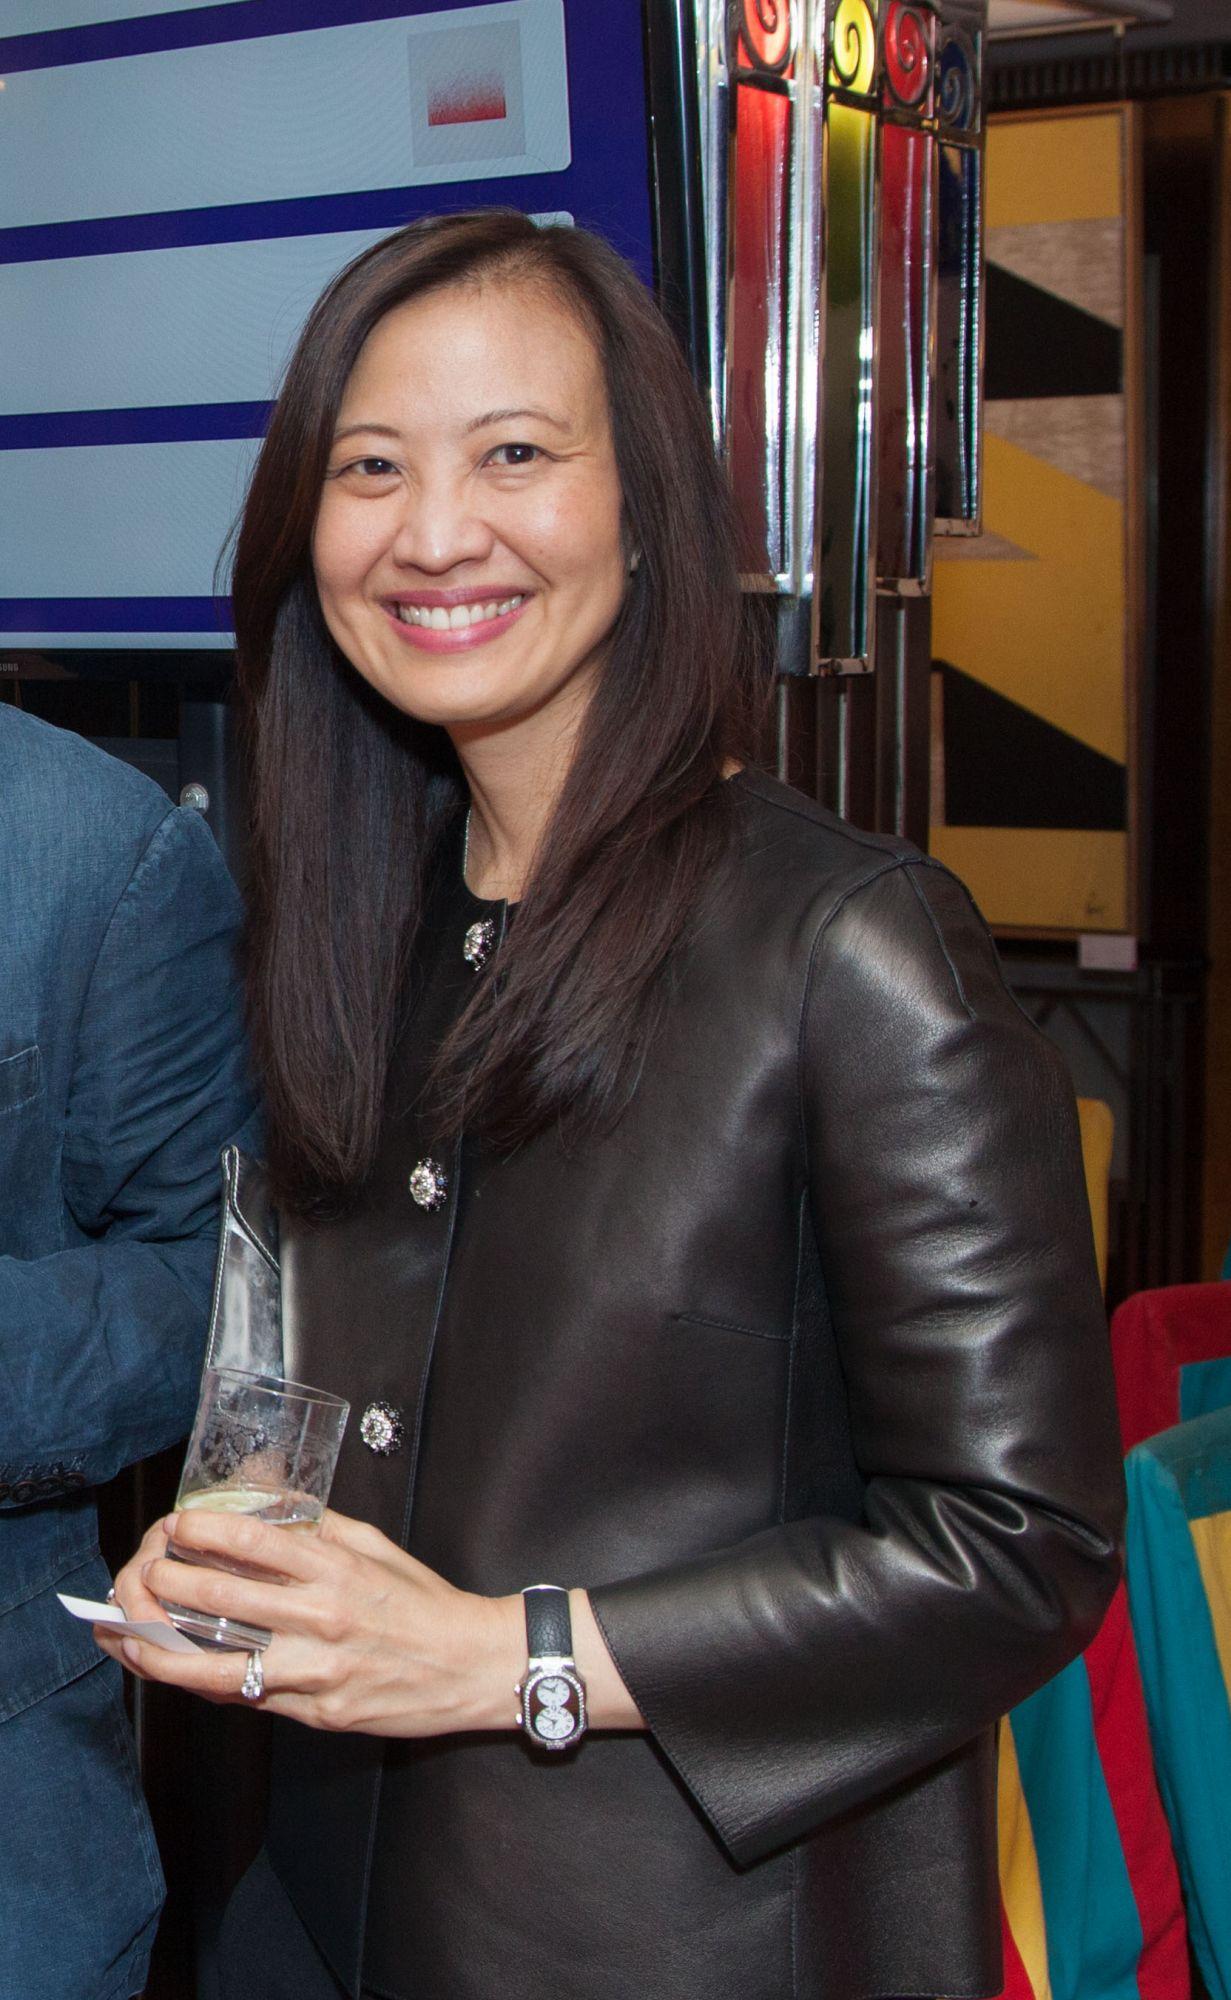 Daphne King-Yao